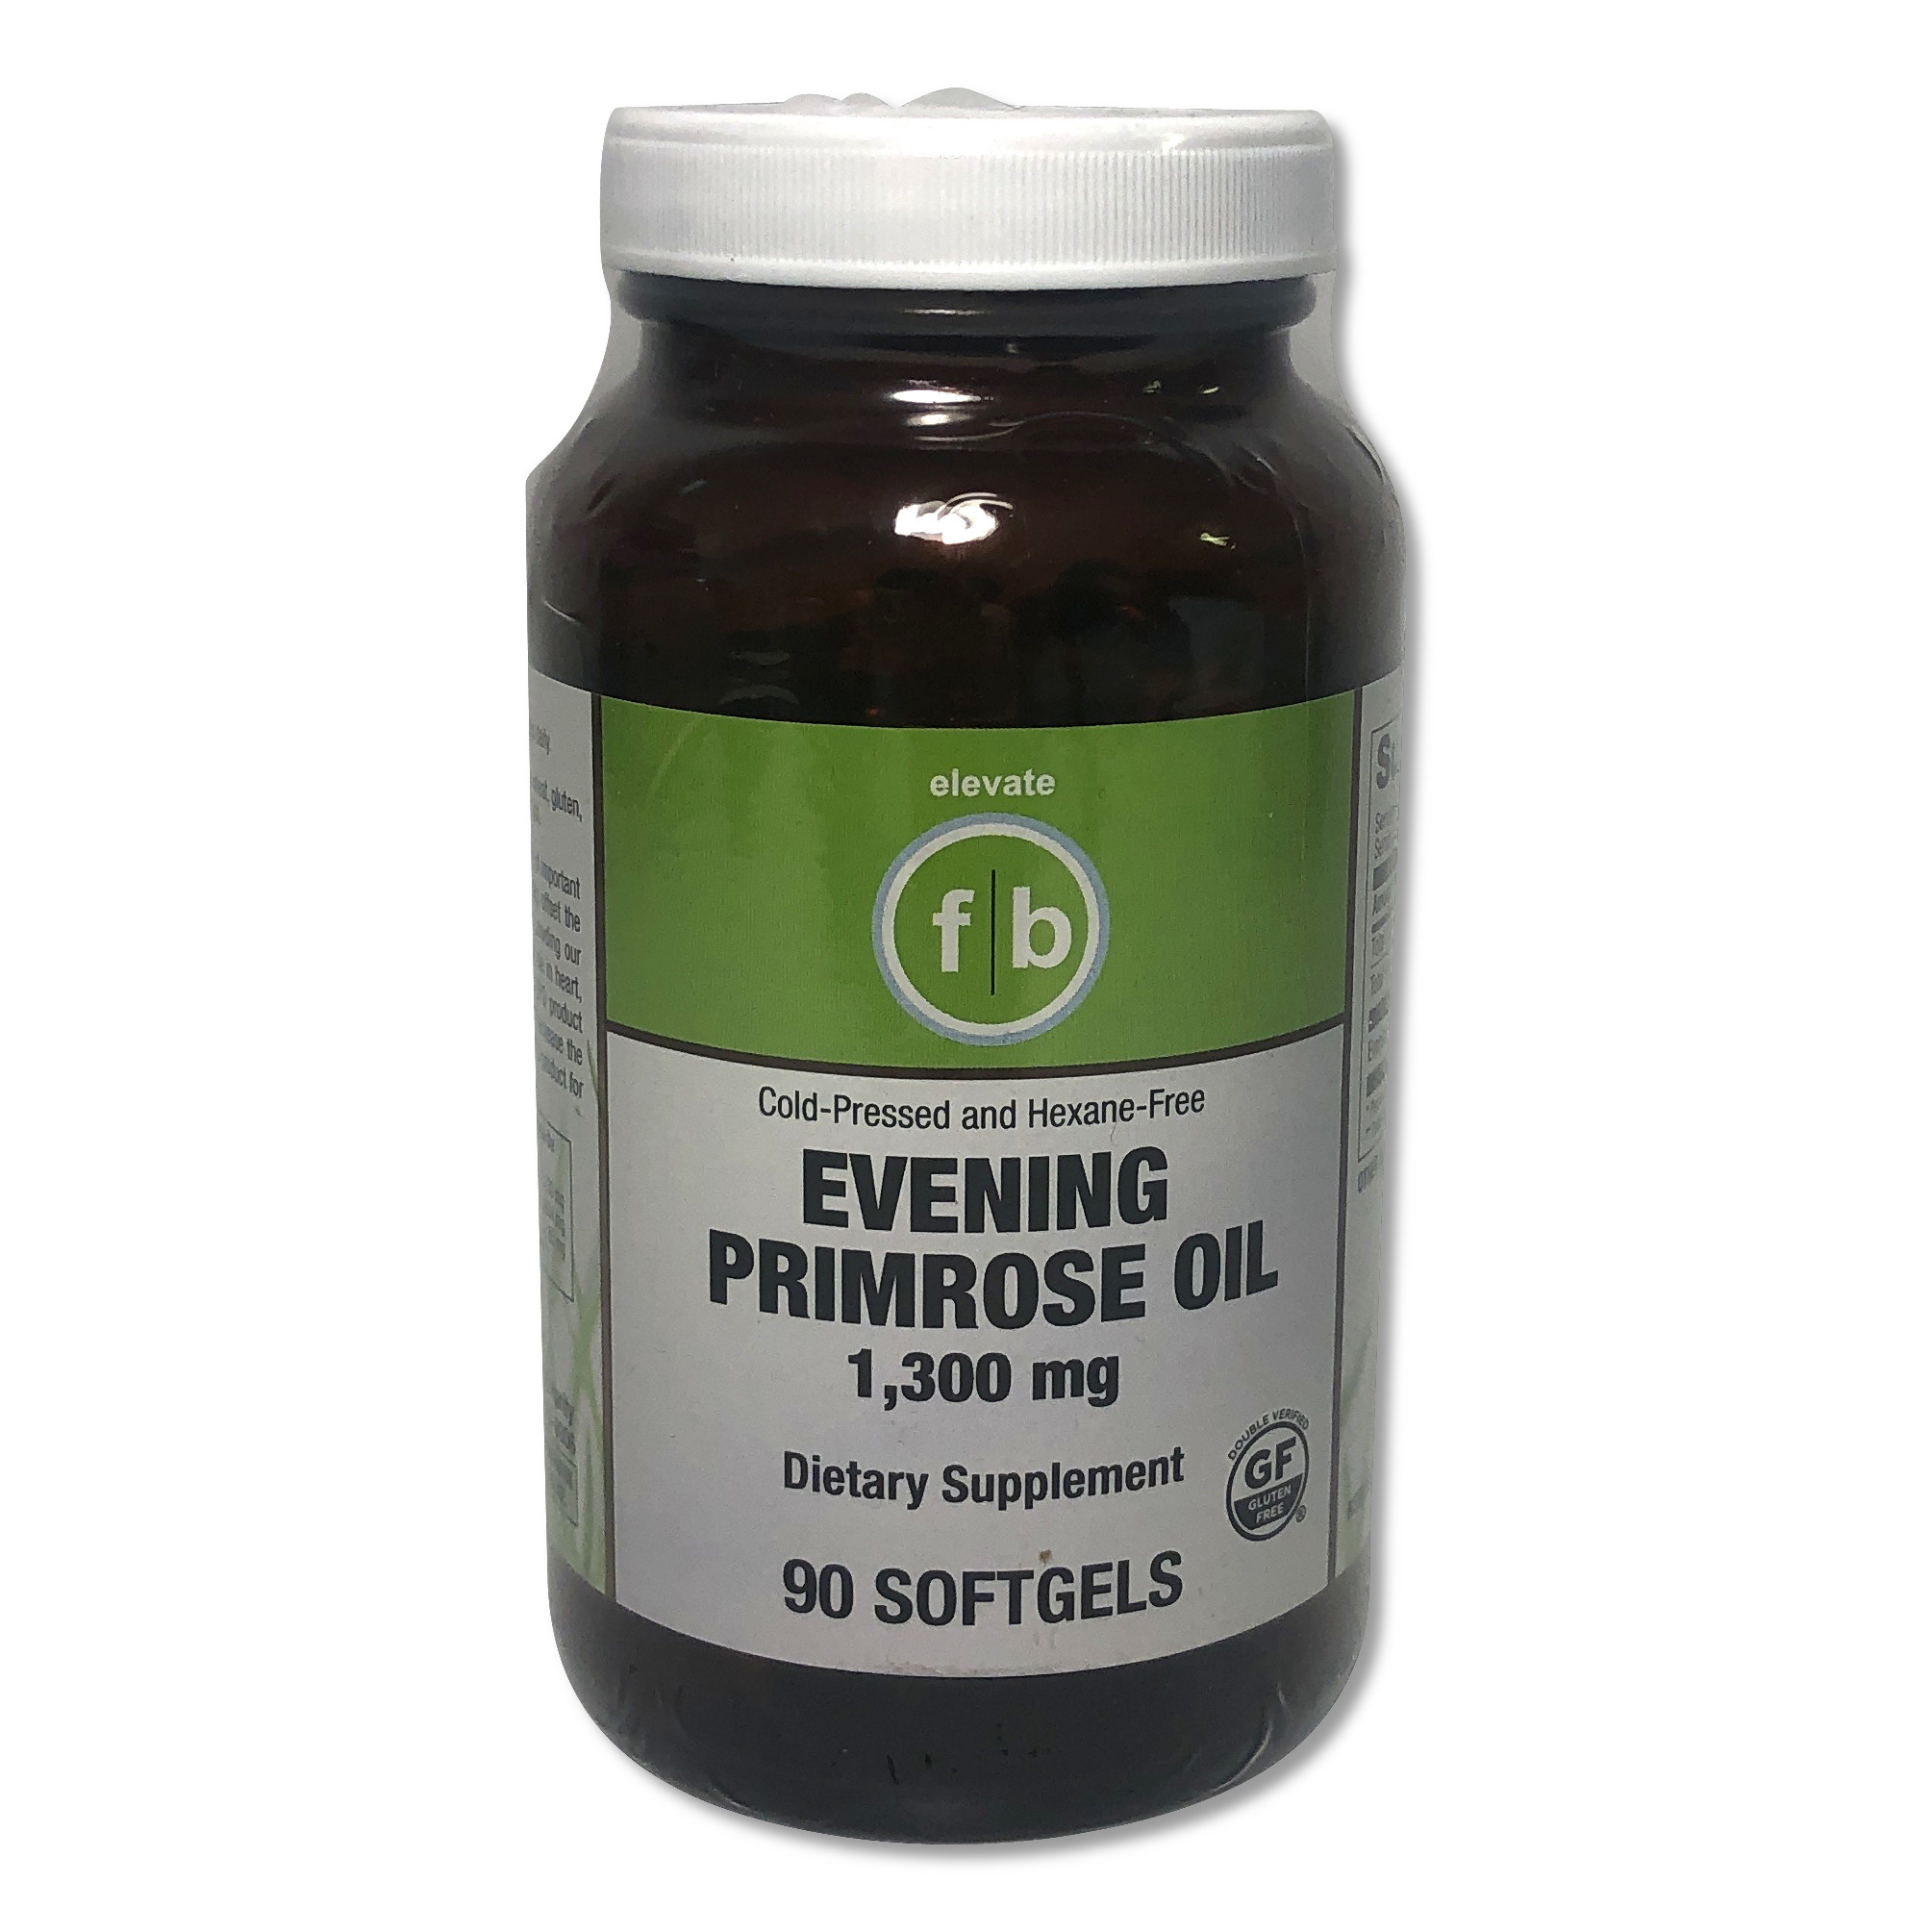 Evening Primrose Oil 1,300mg-1